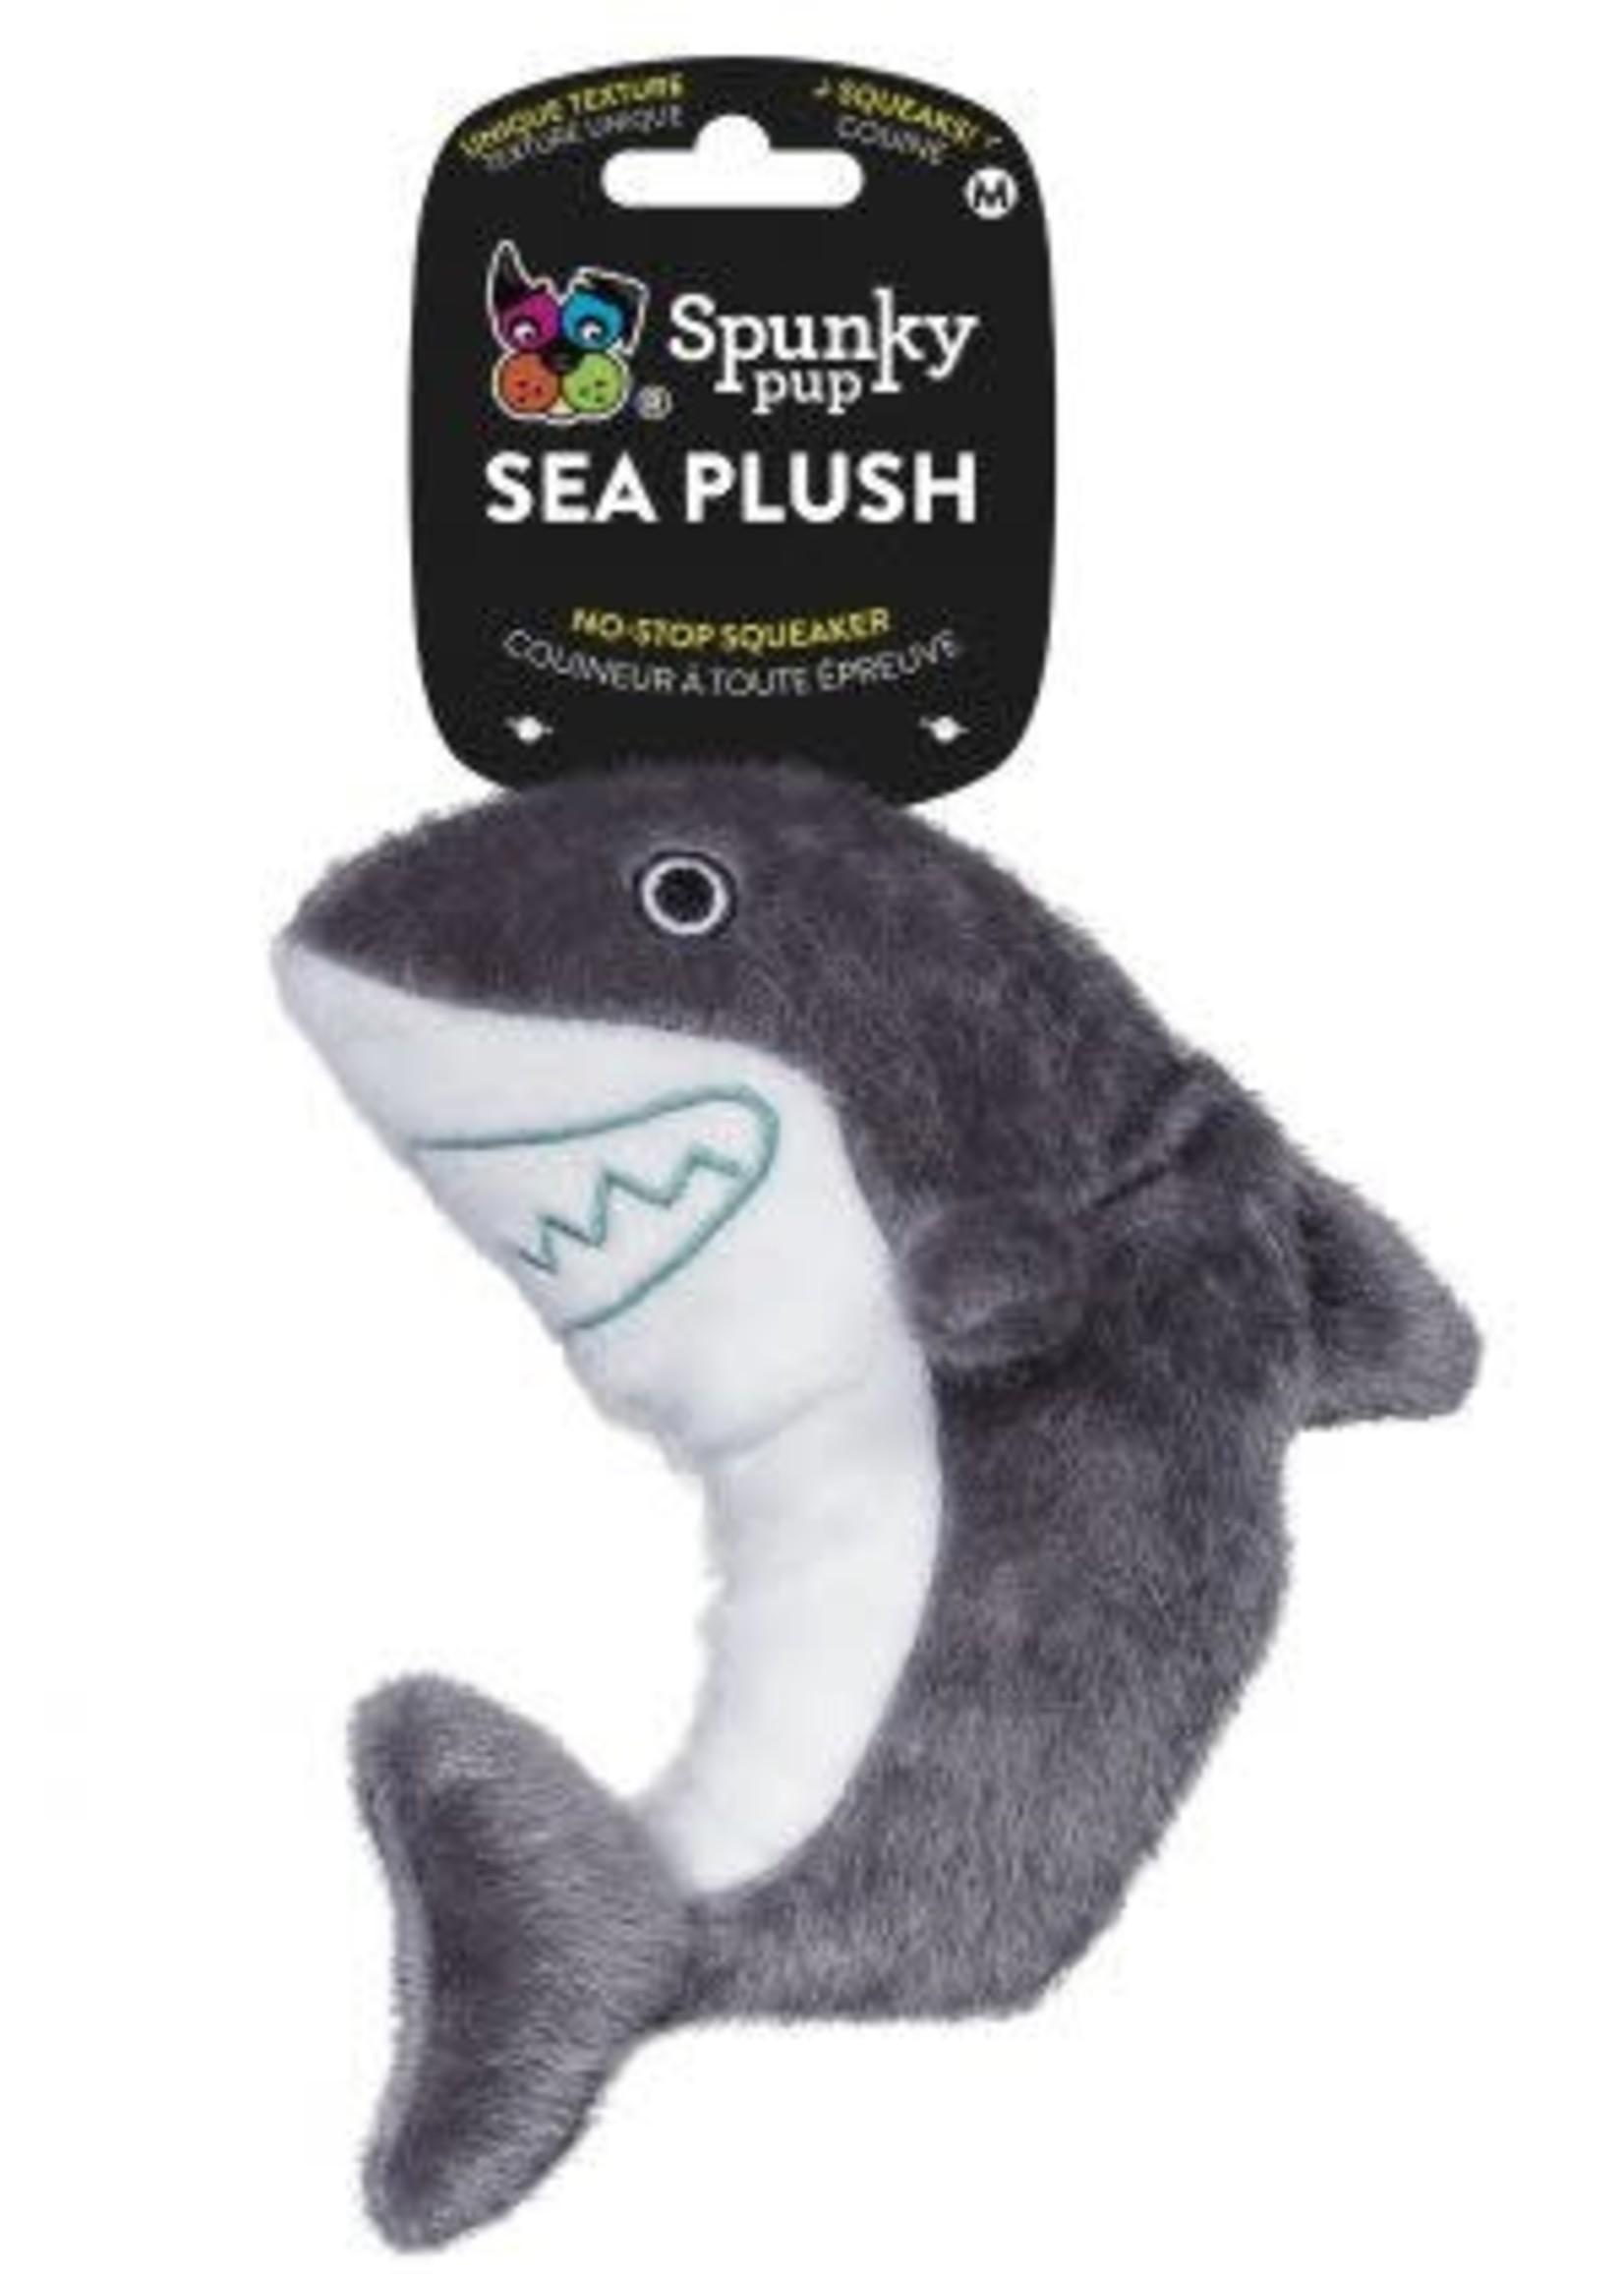 Spunky Pup Spunky Pup Sea Plush Shark Large